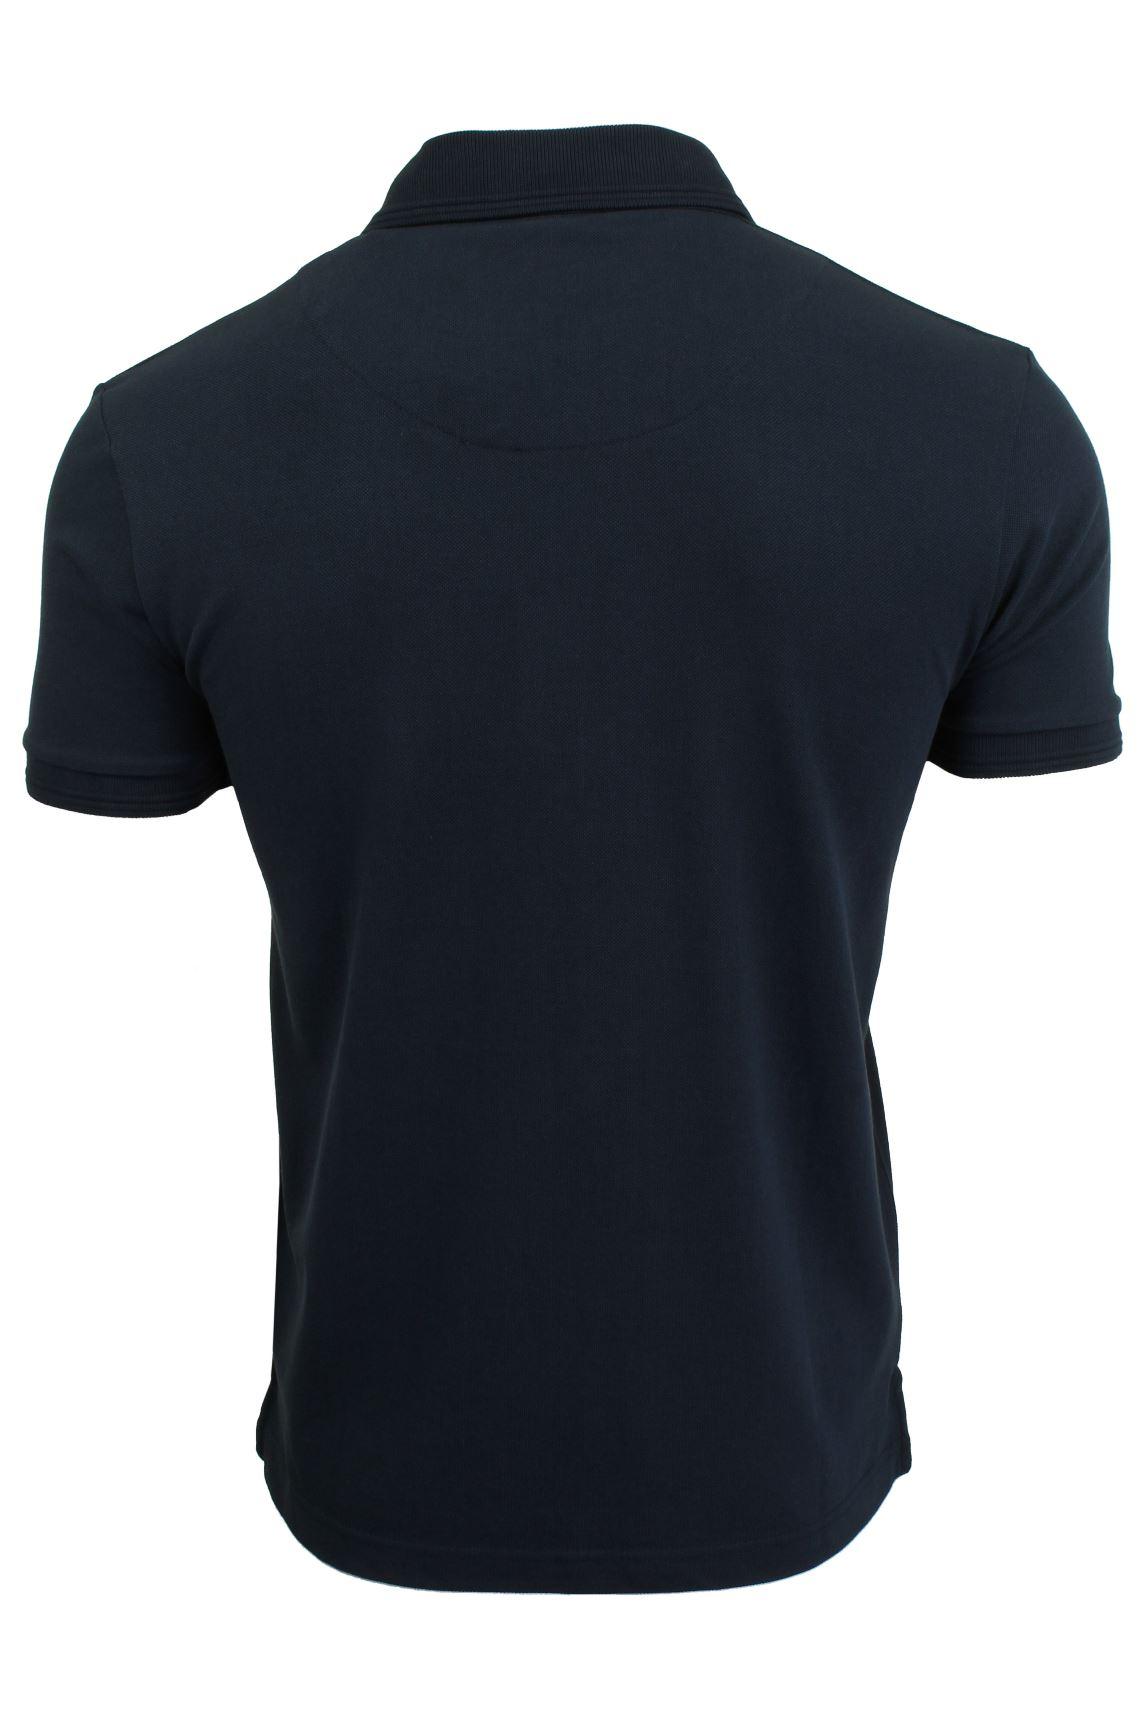 Camisa-Polo-para-hombre-Manga-corta-desde-el-apagon-Collection-by-Voi-Jeans miniatura 10